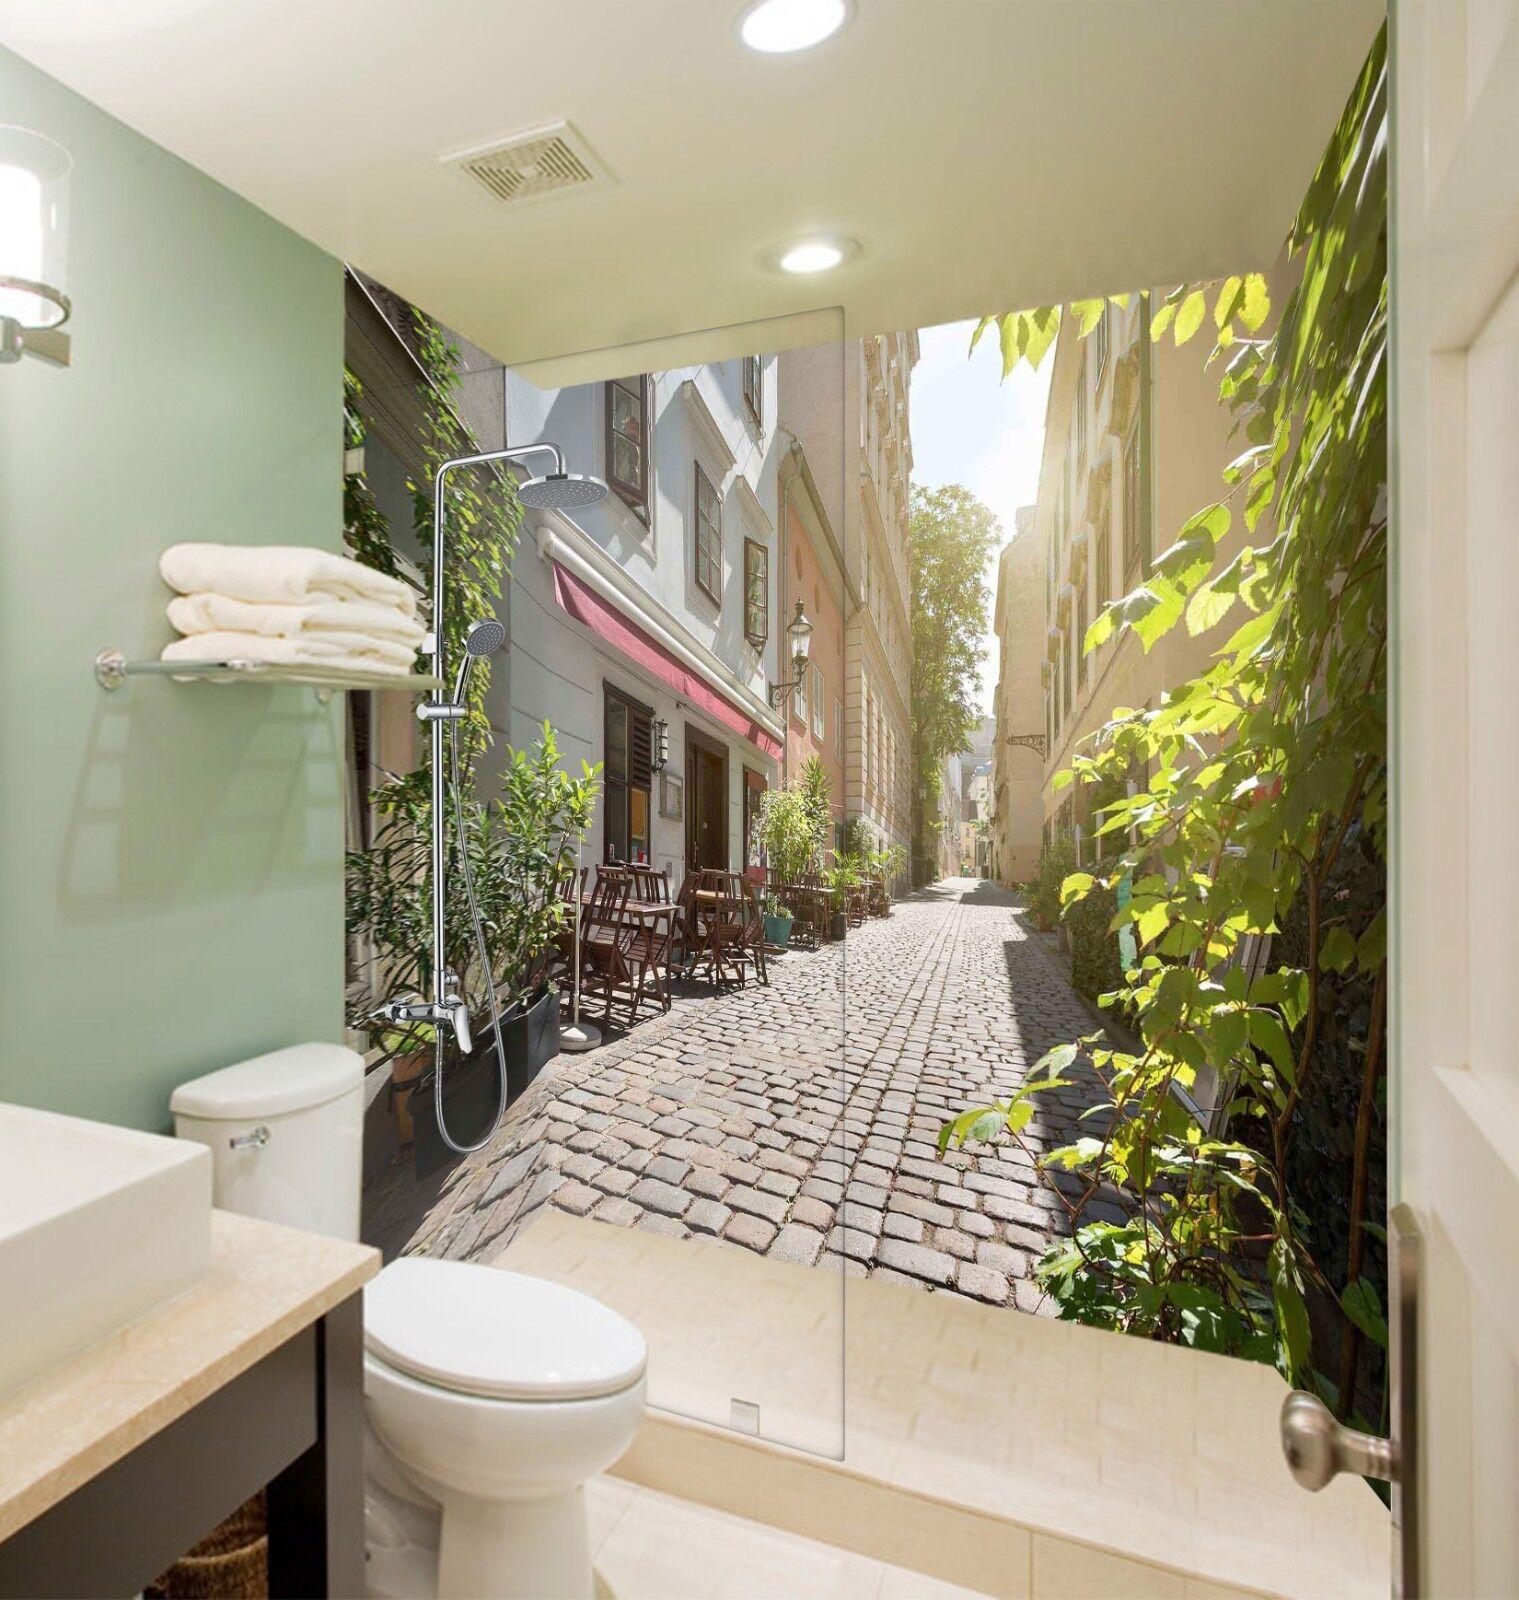 3D Sunshine house 57 WallPaper Bathroom Print Decal Wall Deco AJ WALLPAPER UK